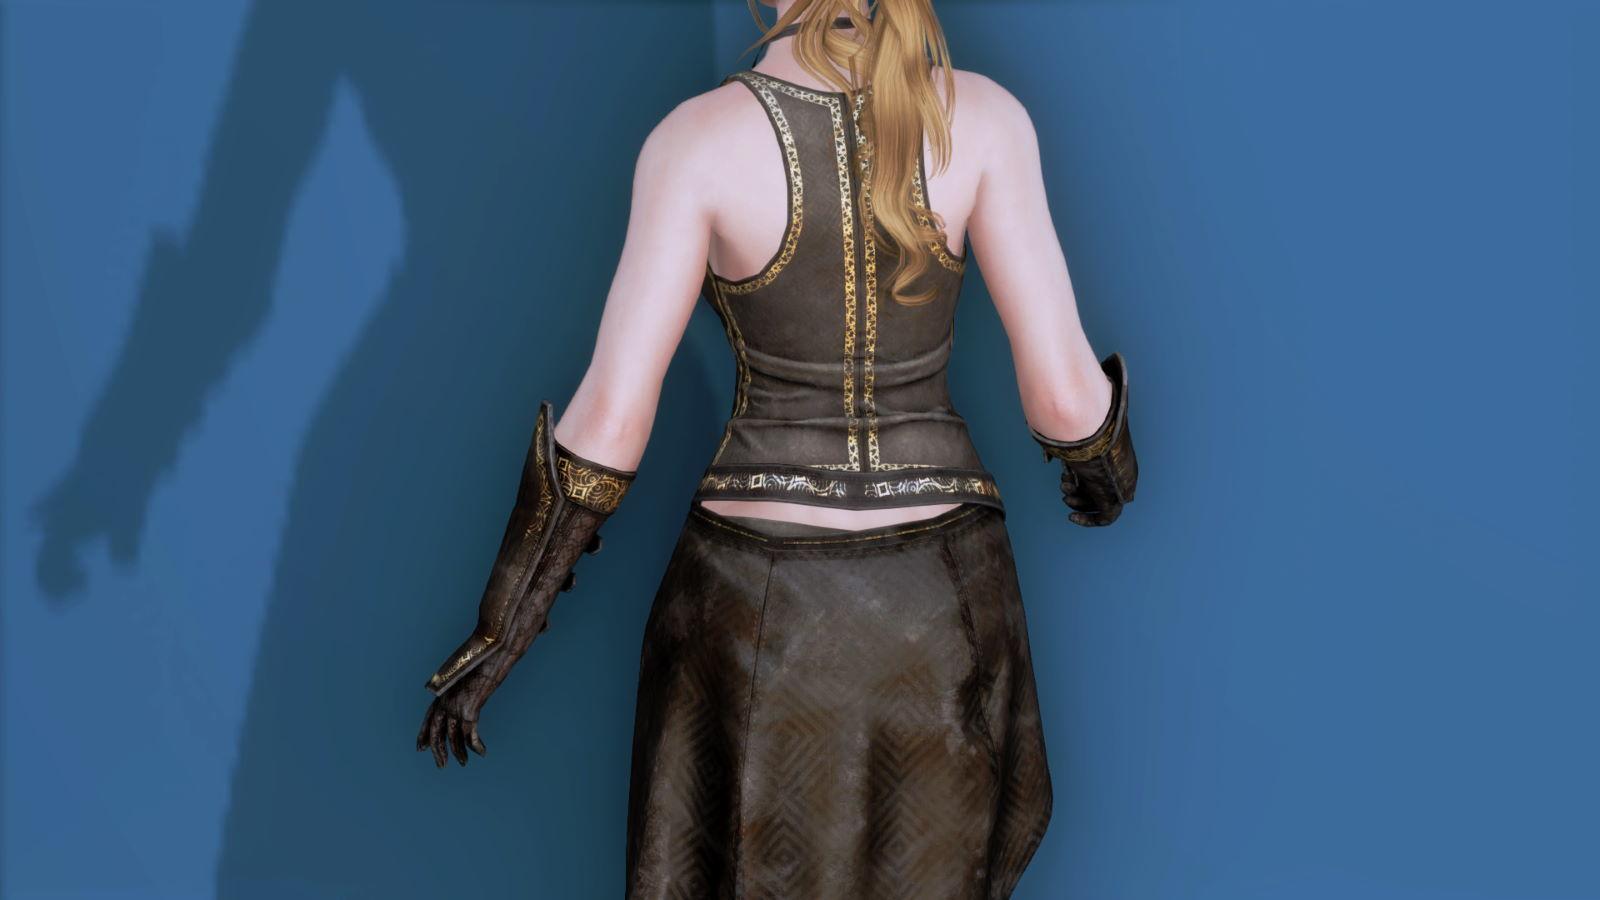 RuggedRogueSSE 223-1 Pose Up-Ba-F Vest Skirt W 1